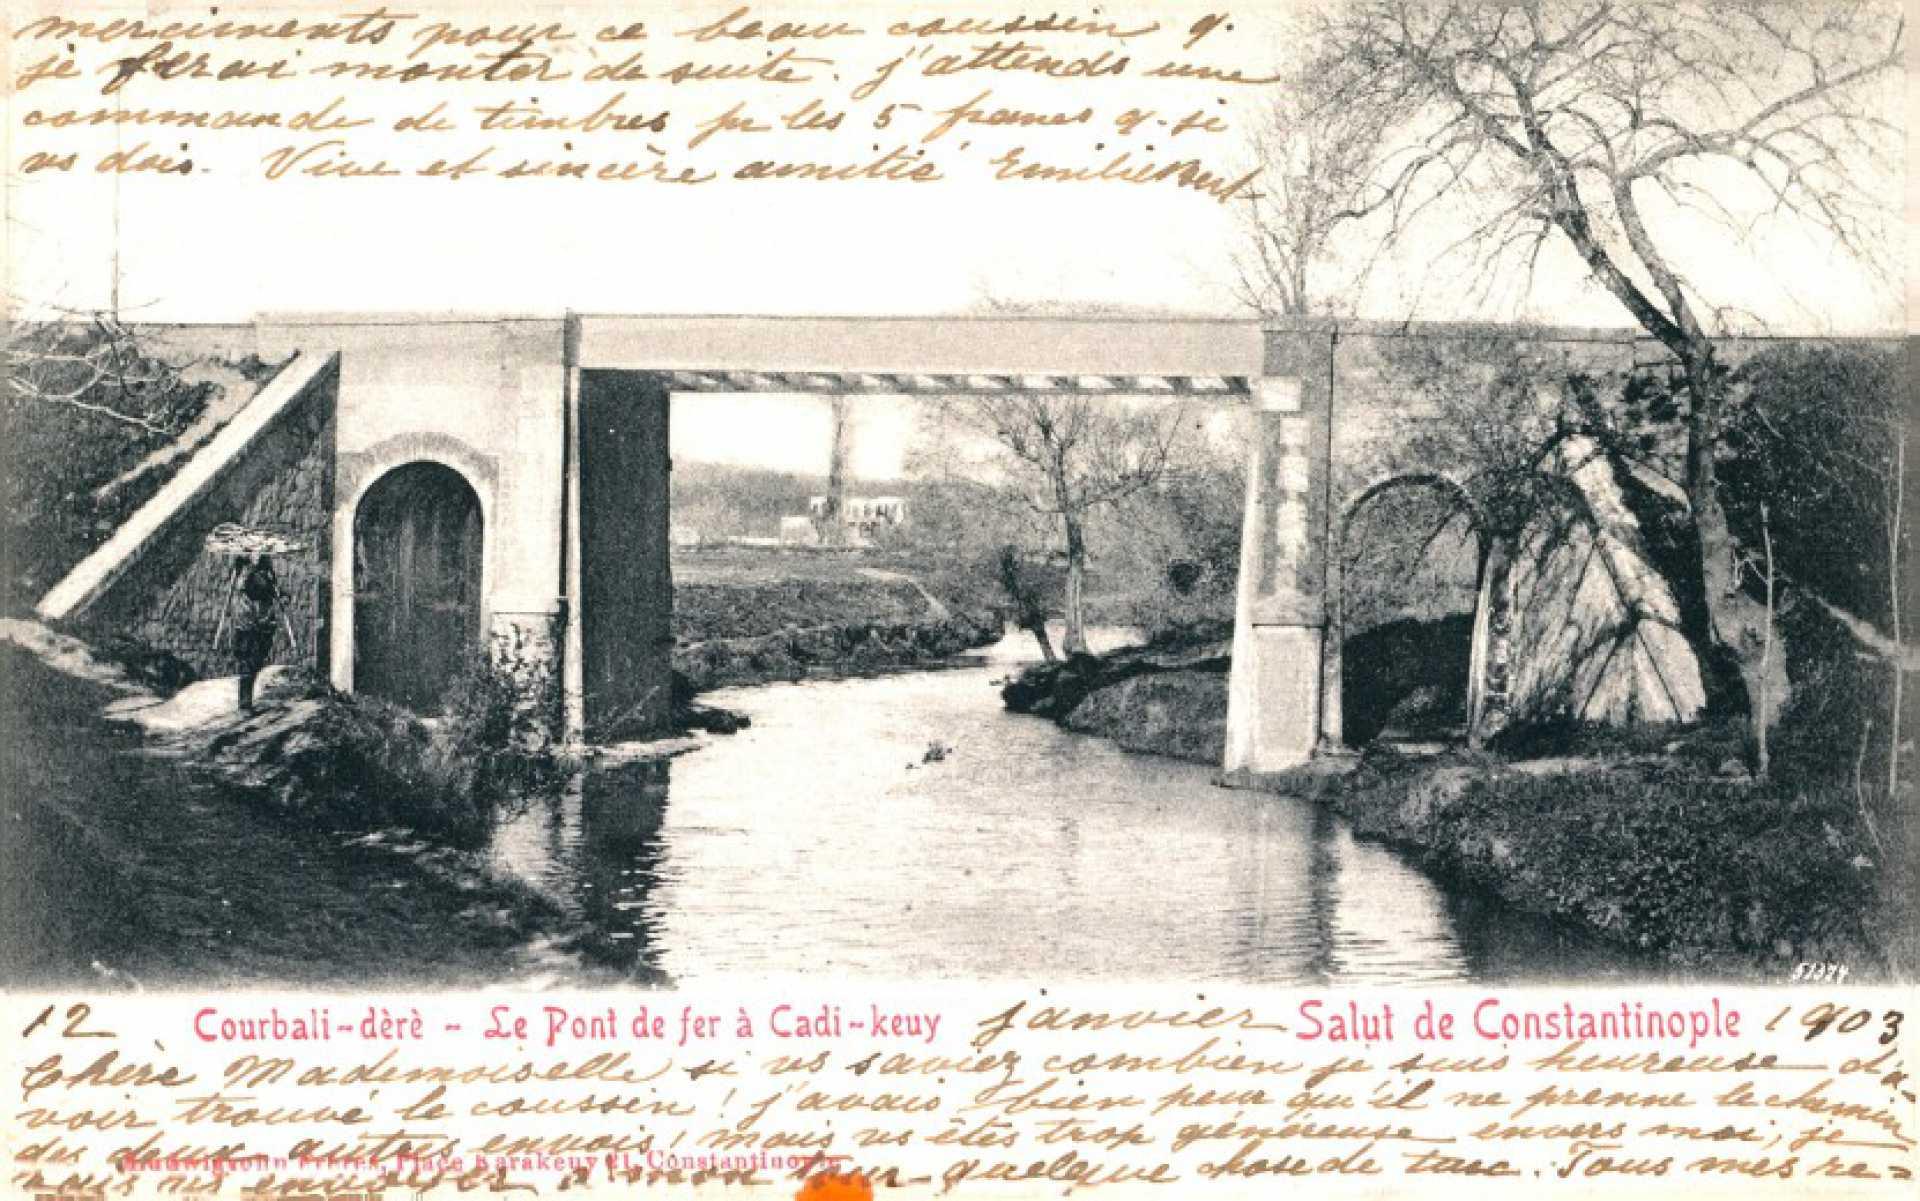 Courbali-dere-Le Pont de fer a Cadi-keuy